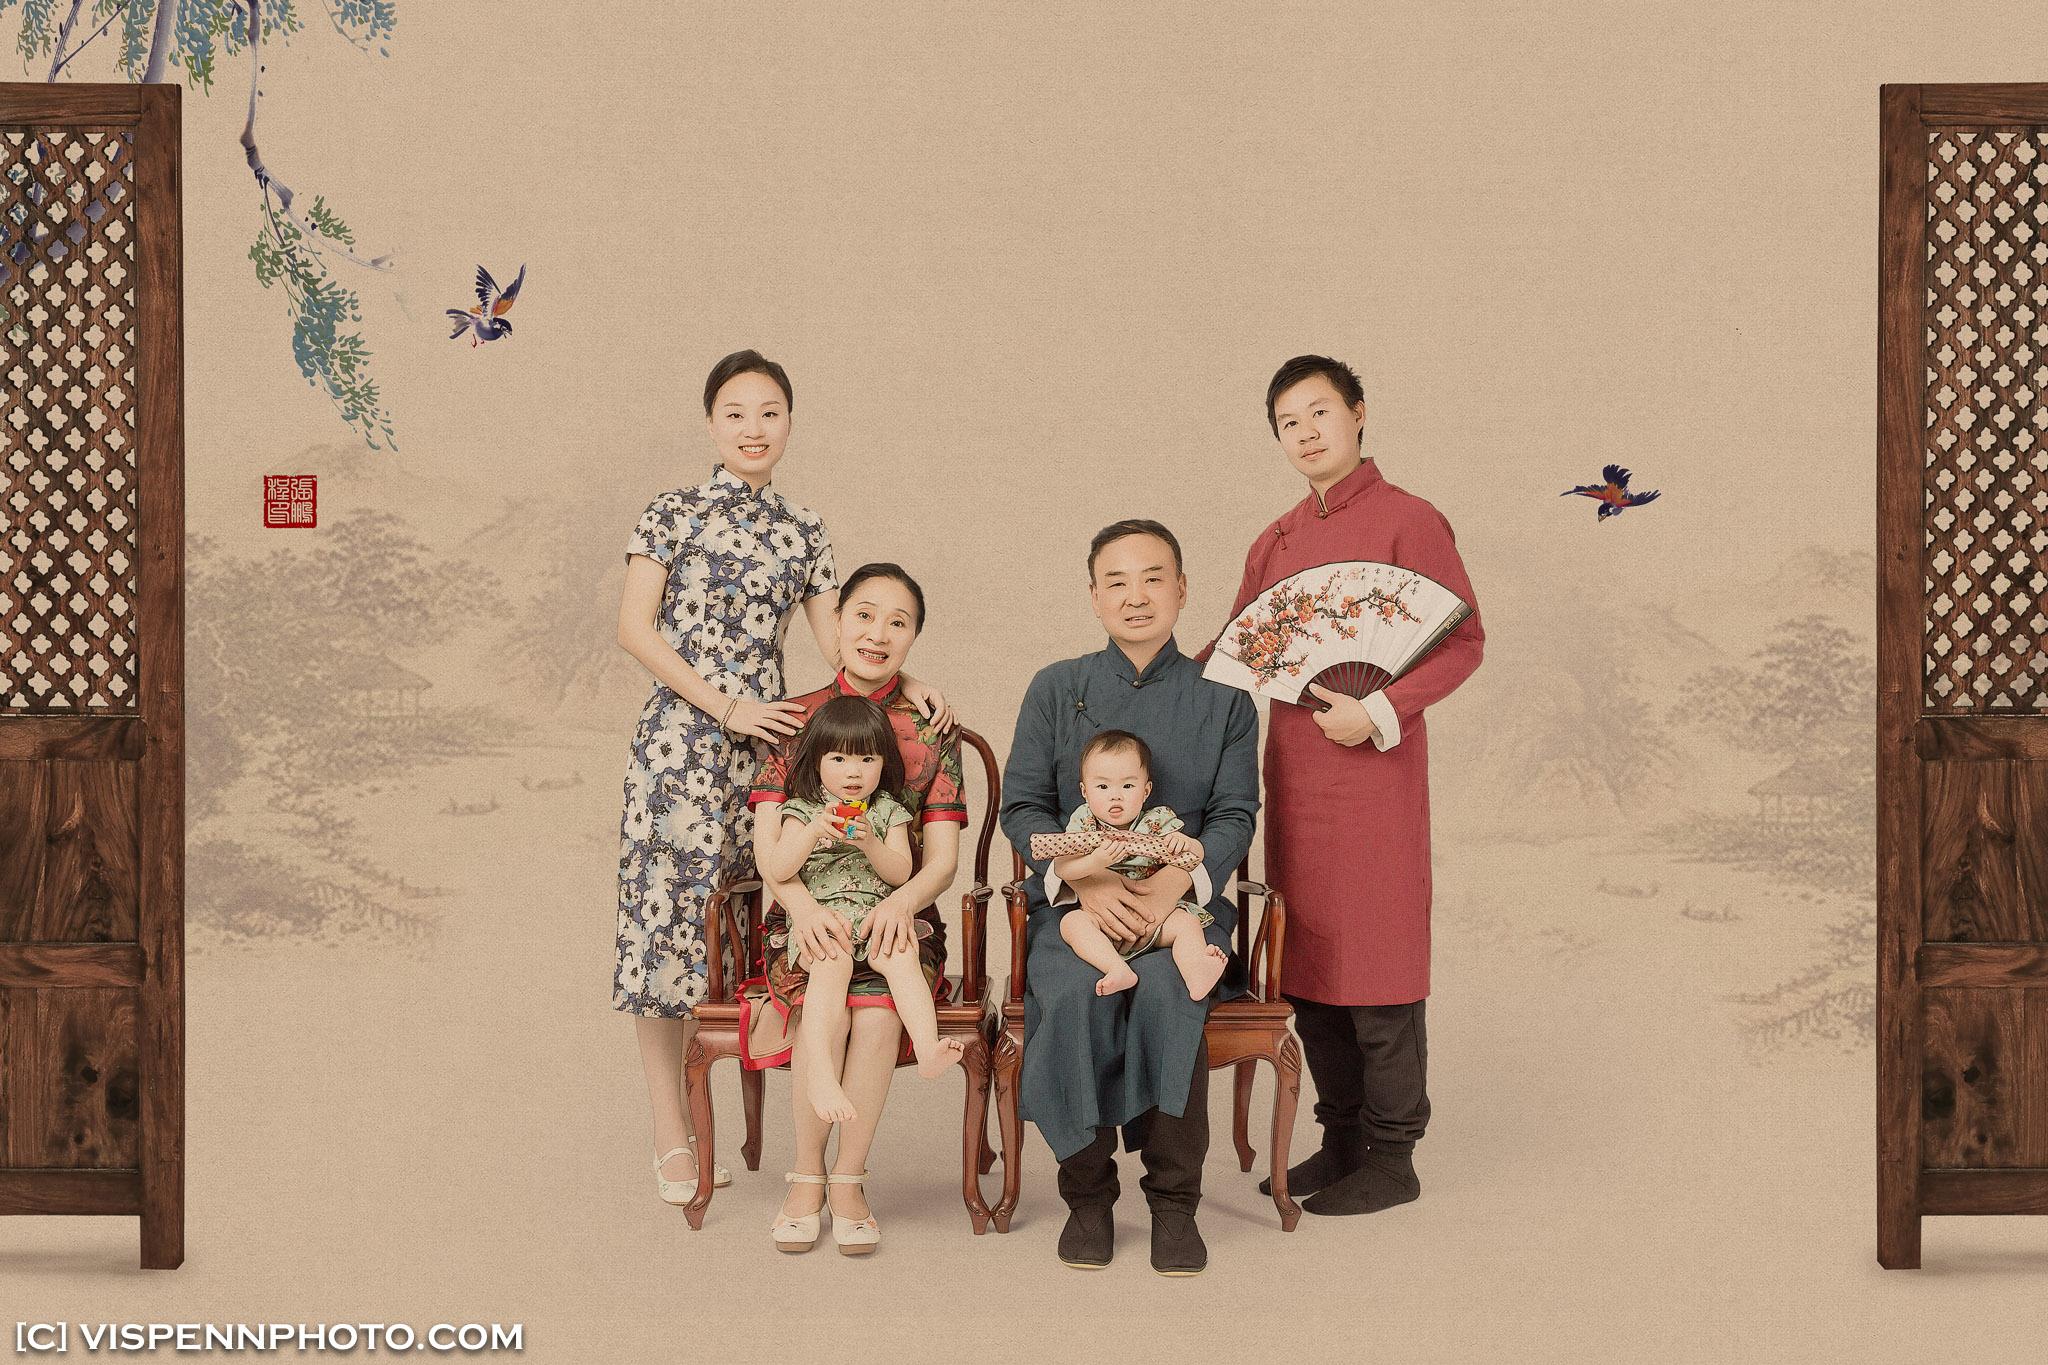 Melbourne Newborn Baby Family Photo BaoBao VISPENN 墨尔本 儿童 宝宝 百天照 满月照 孕妇照 全家福 KIDS VISPENN SelinaFU 0325